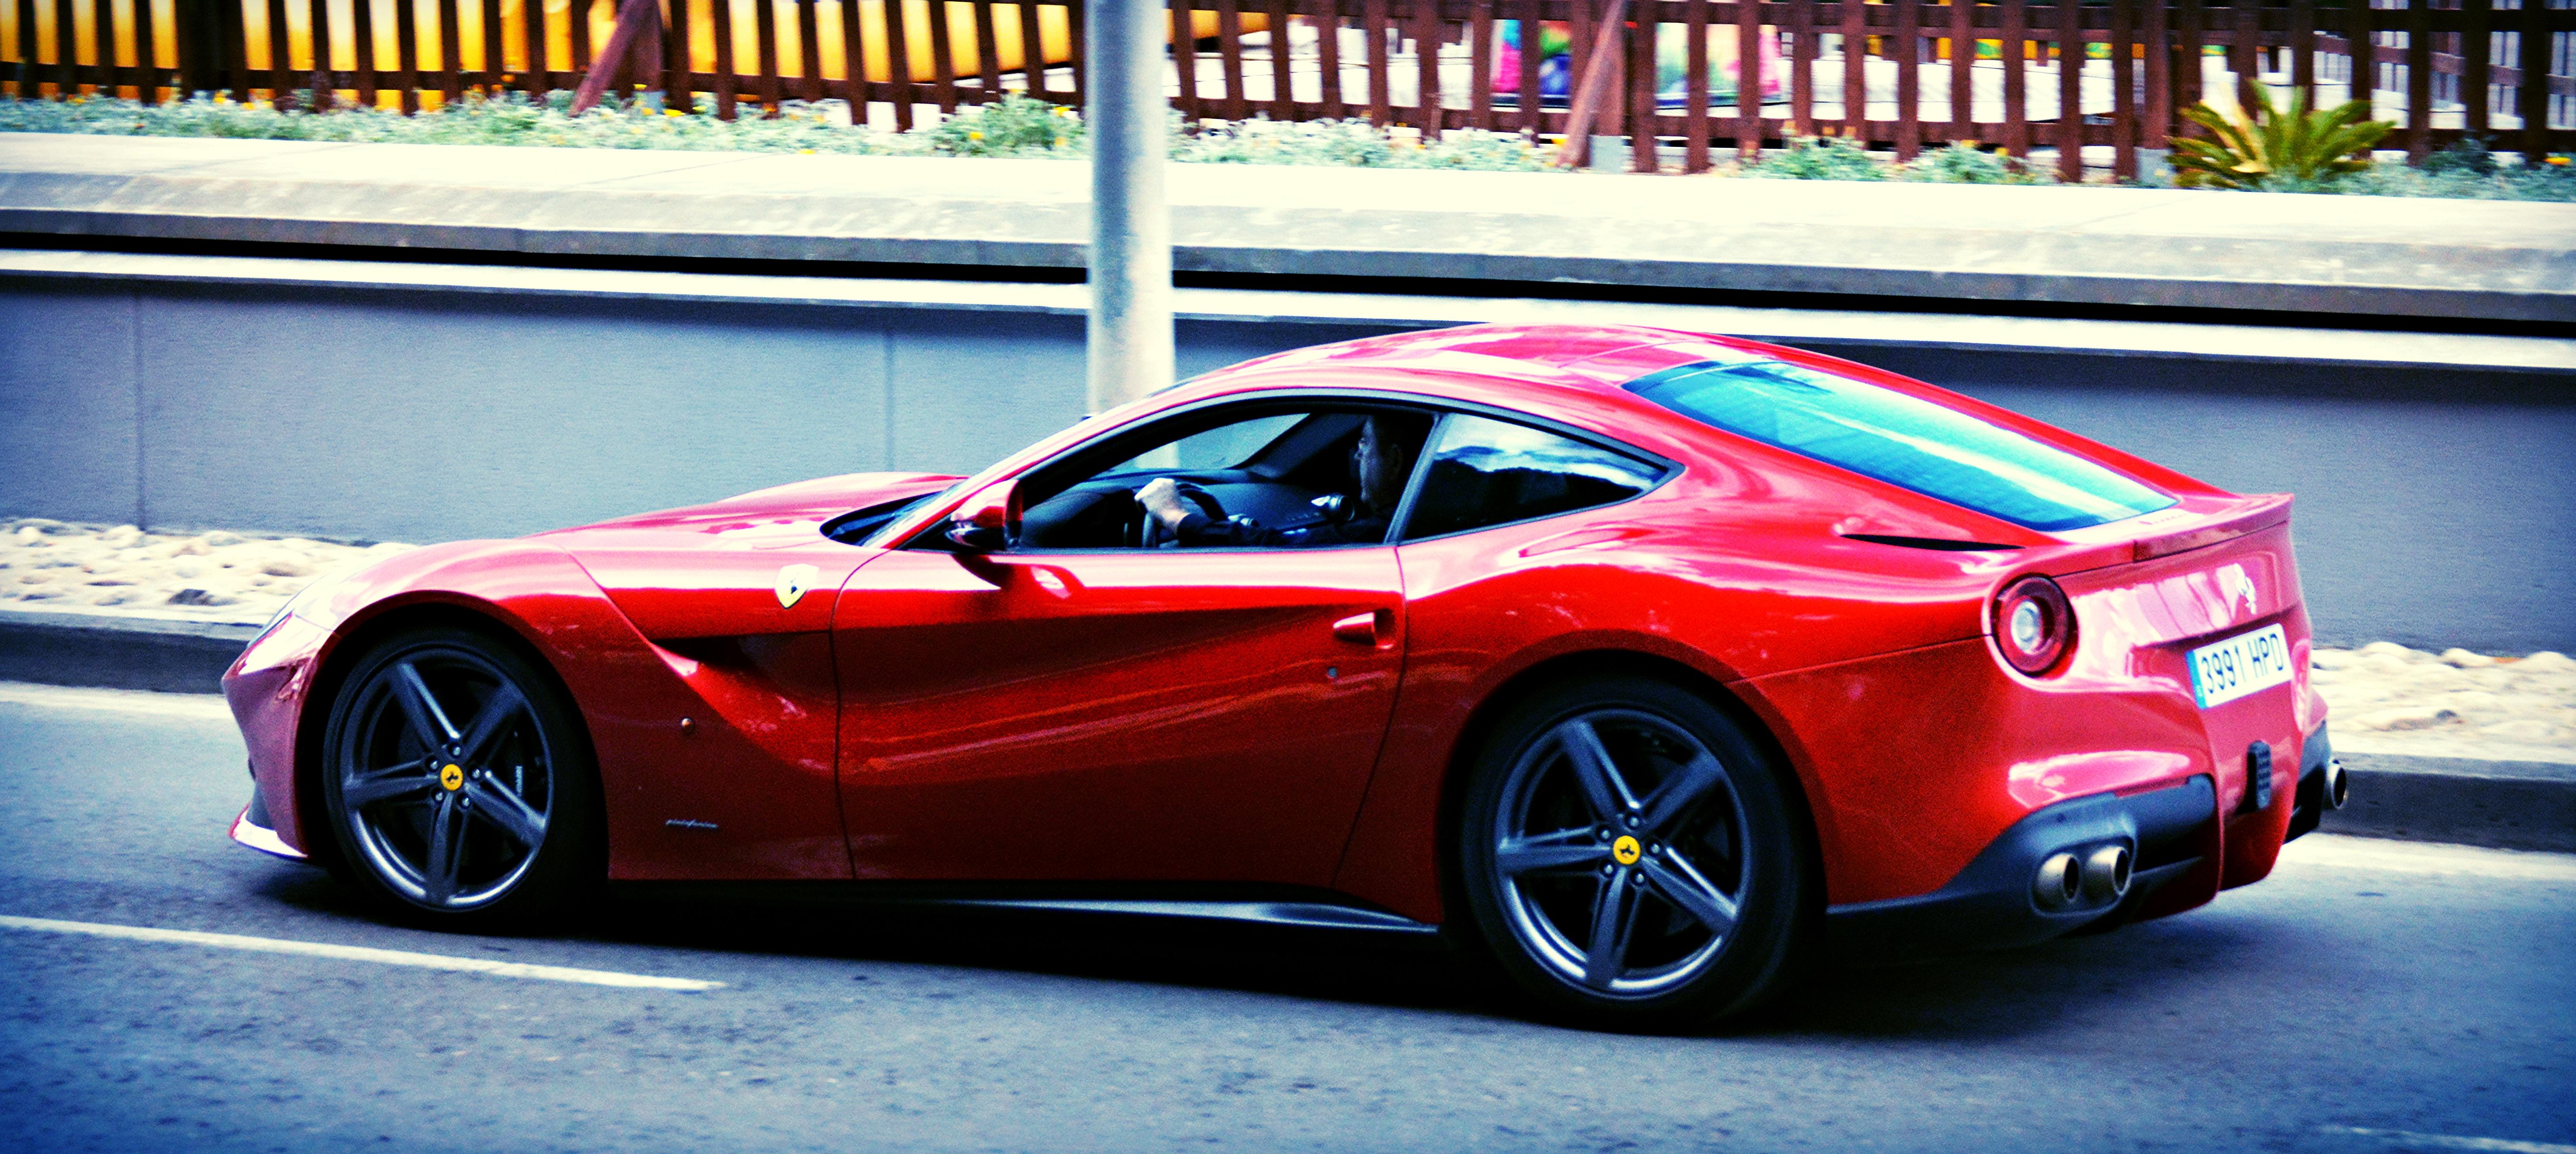 File:Ferrari F12 Berlinetta (26423008886).jpg - Wikimedia Commons